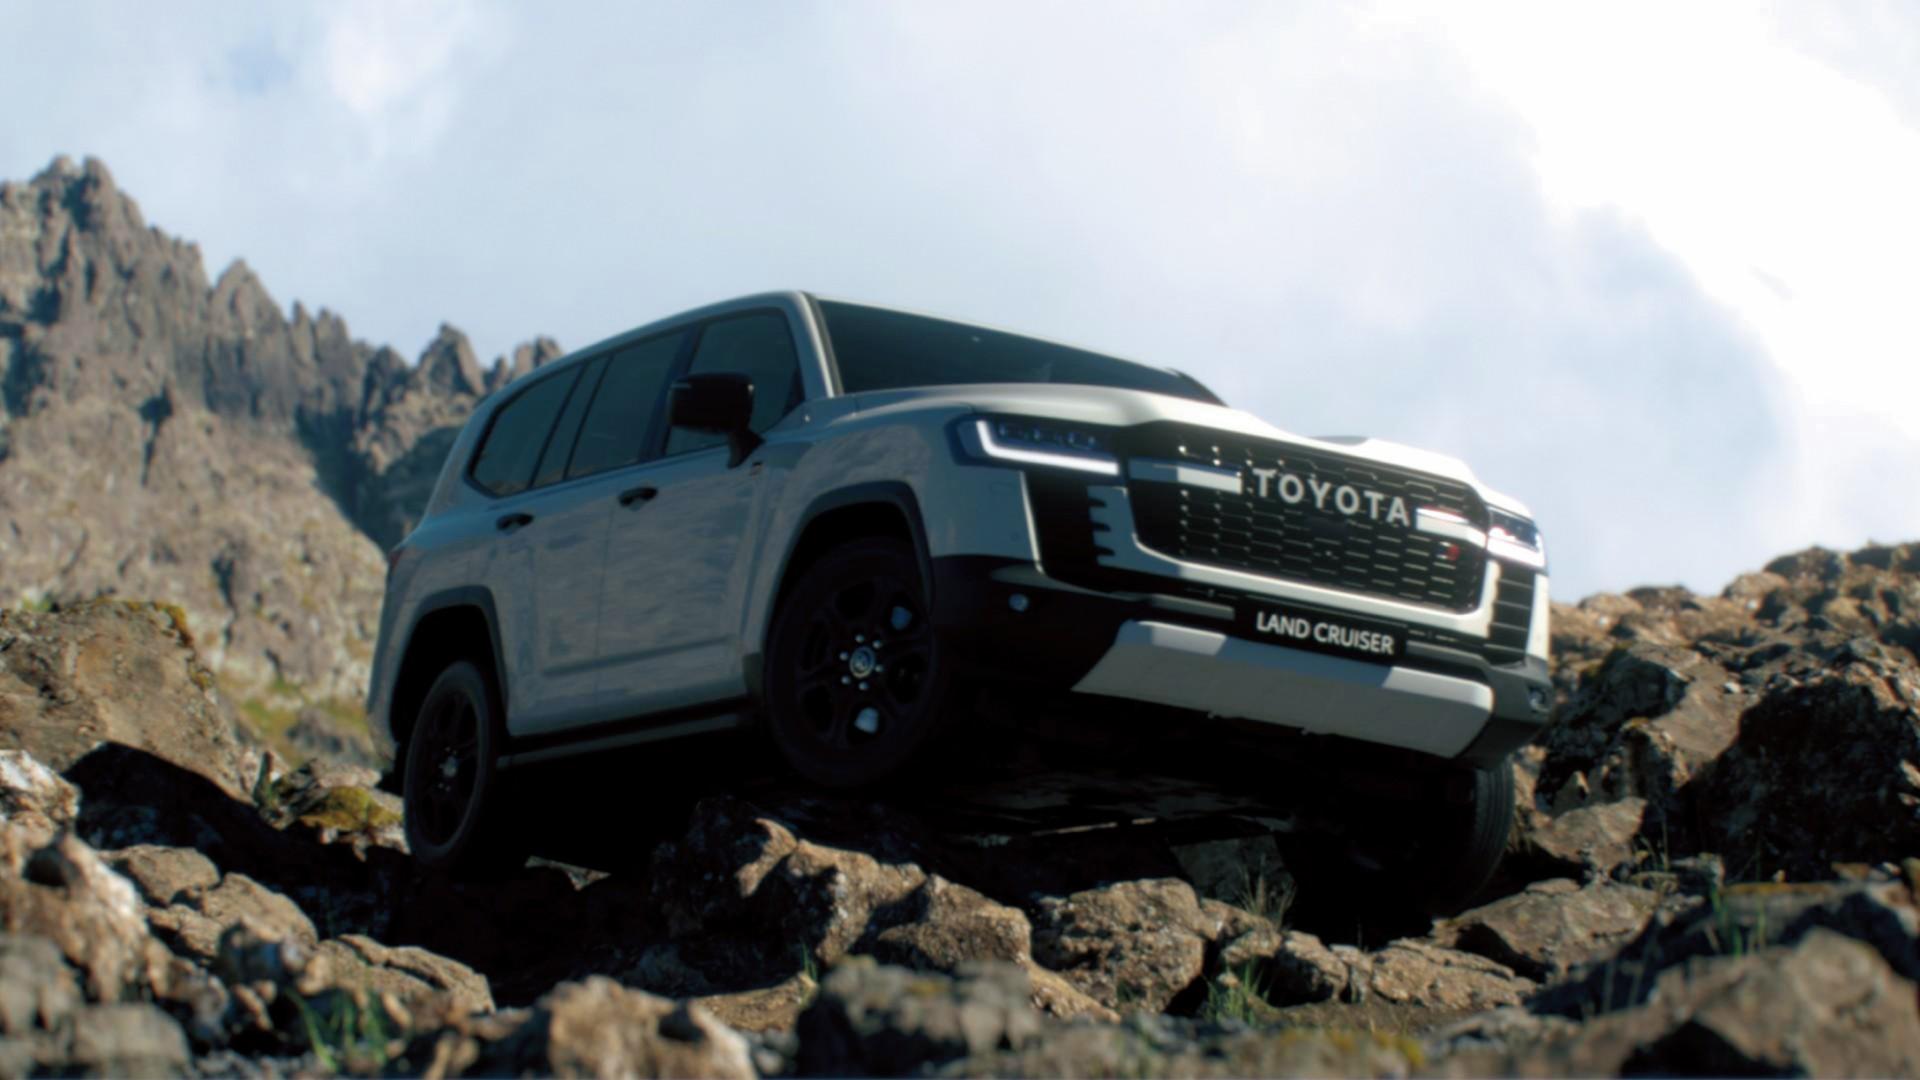 Toyota Land Cruiser 300 2022 (29)